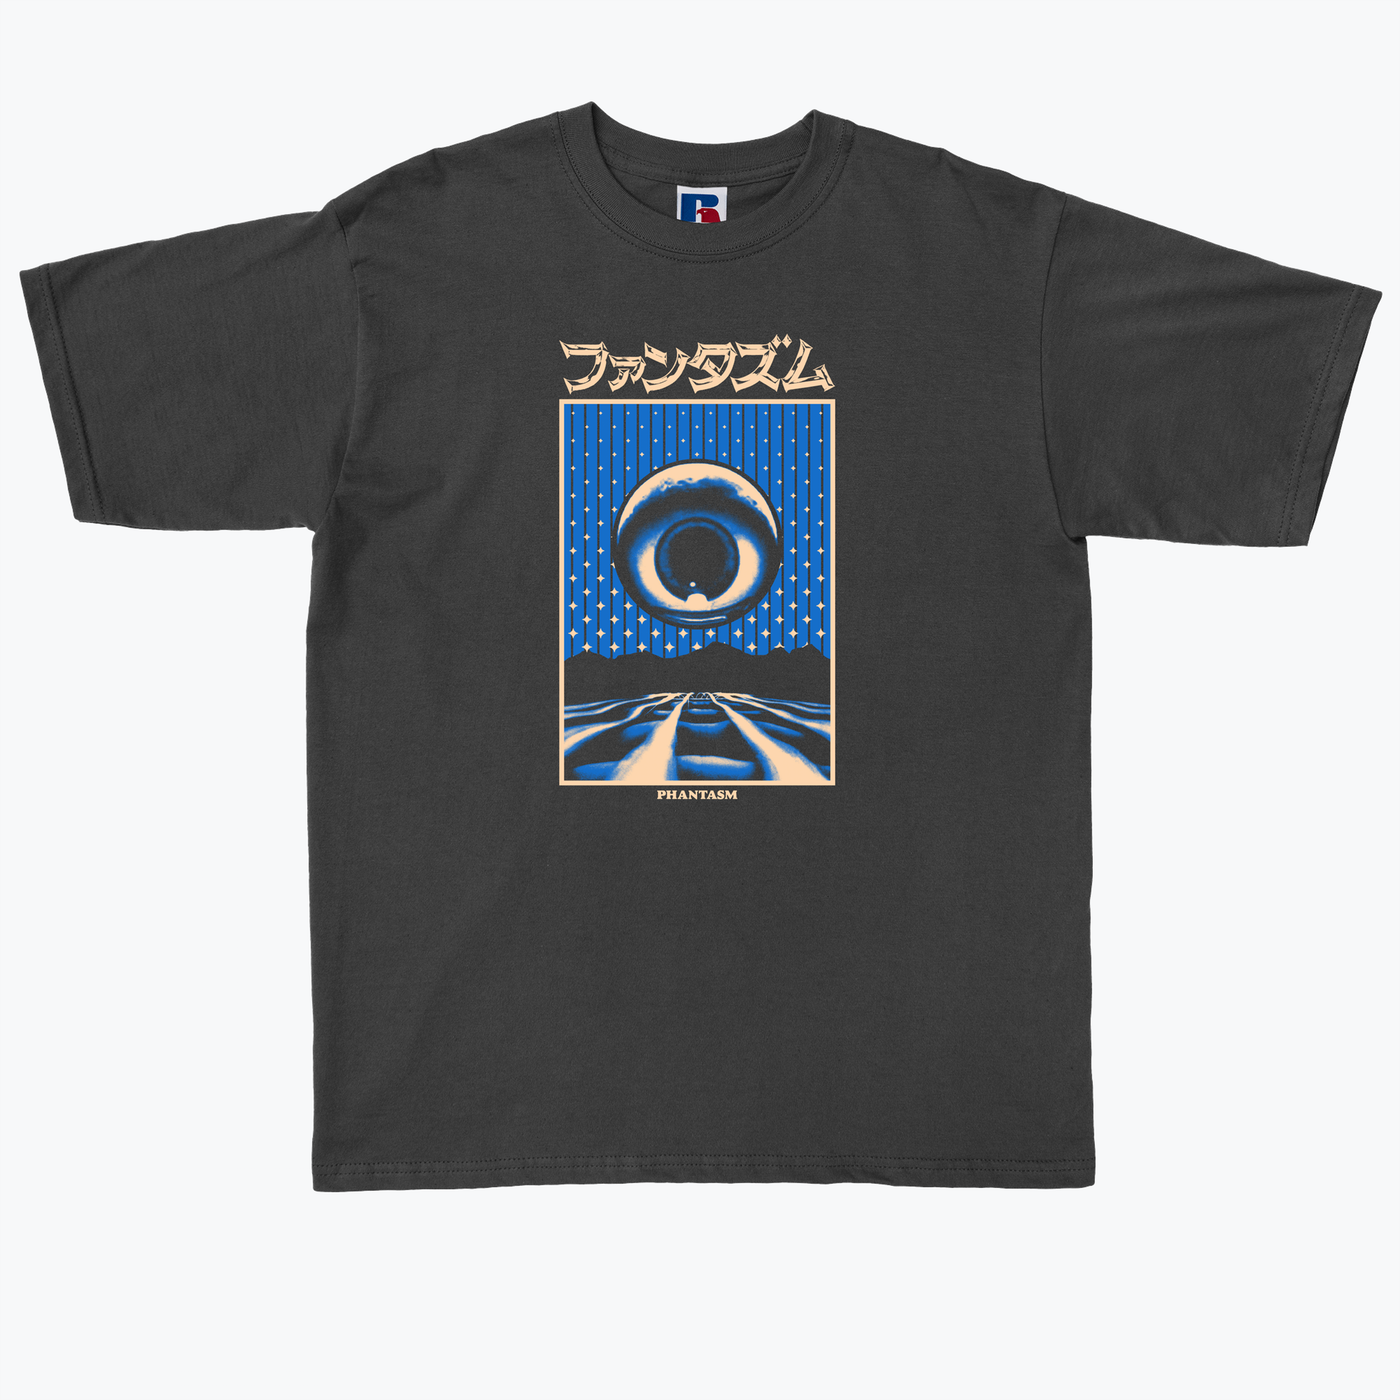 The Phantasm T shirt by Klutz Fiction in 2020   Shirts, Mens